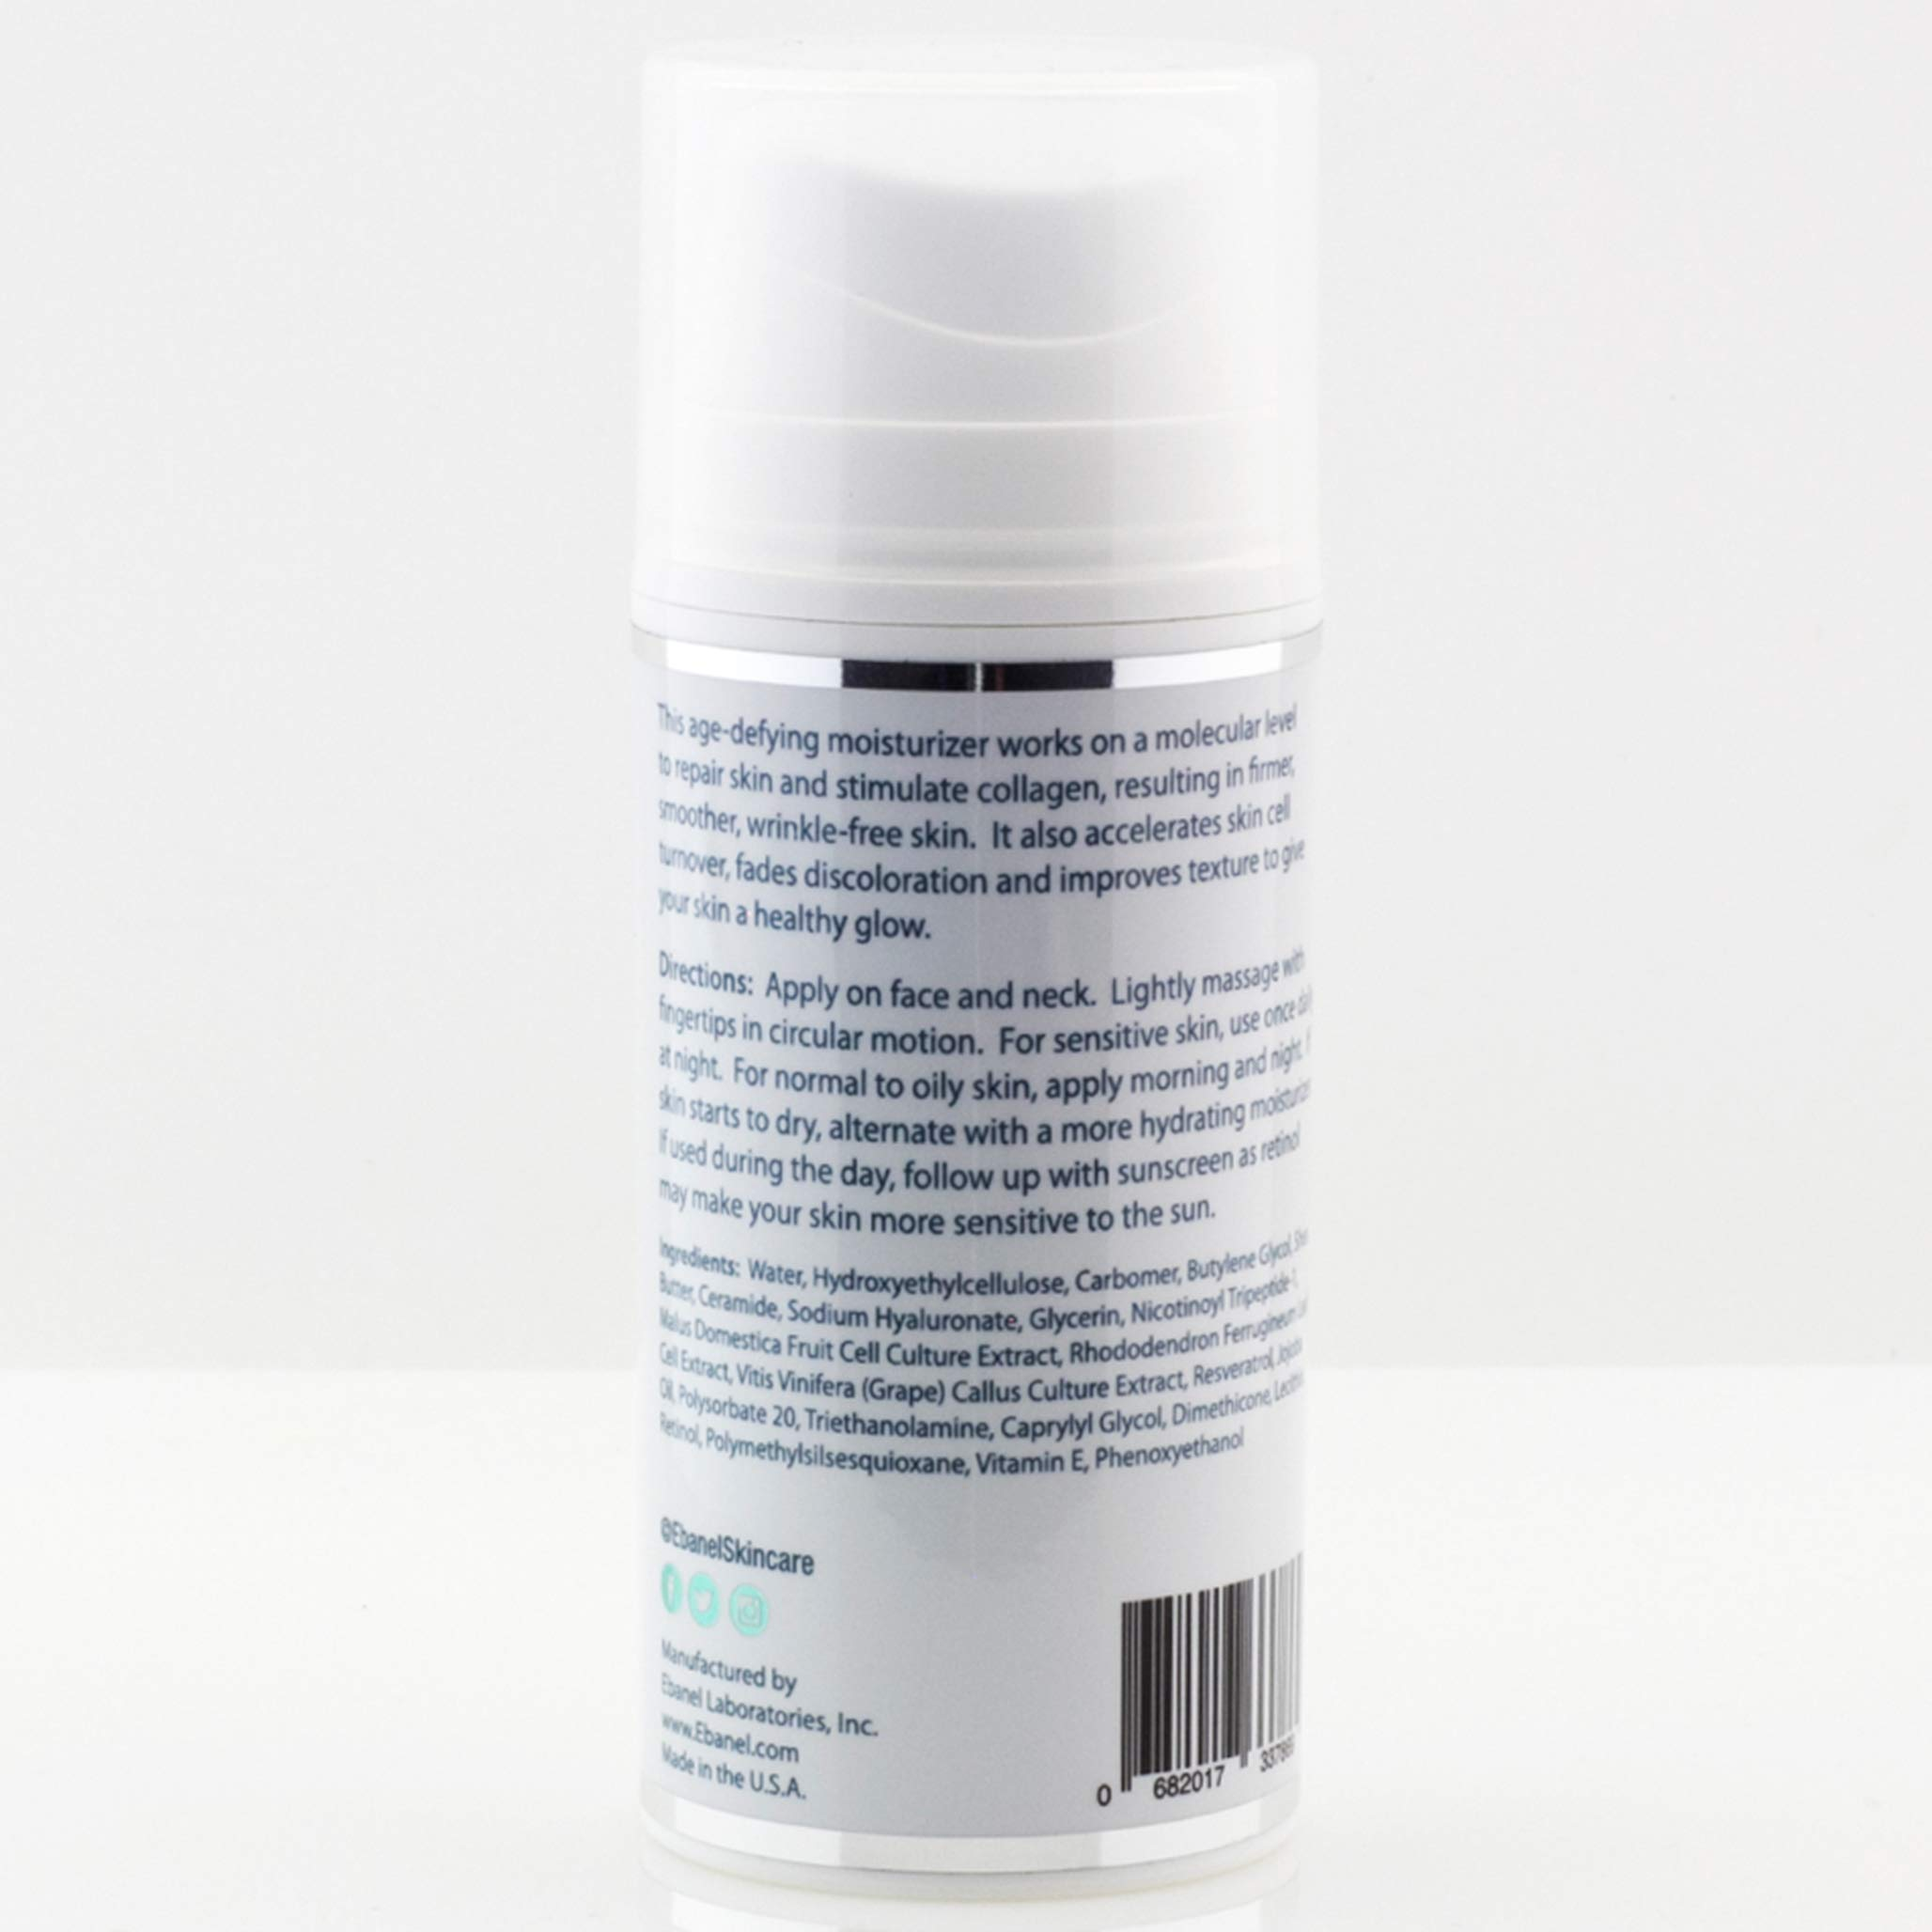 (3.5 Oz) Ebanel Advanced 2.5% Retinol Stem Cell Moisturizer with Age Defying Liposomal Technology - Hyaluronic Acid, Resveratrol, Peptide Complex